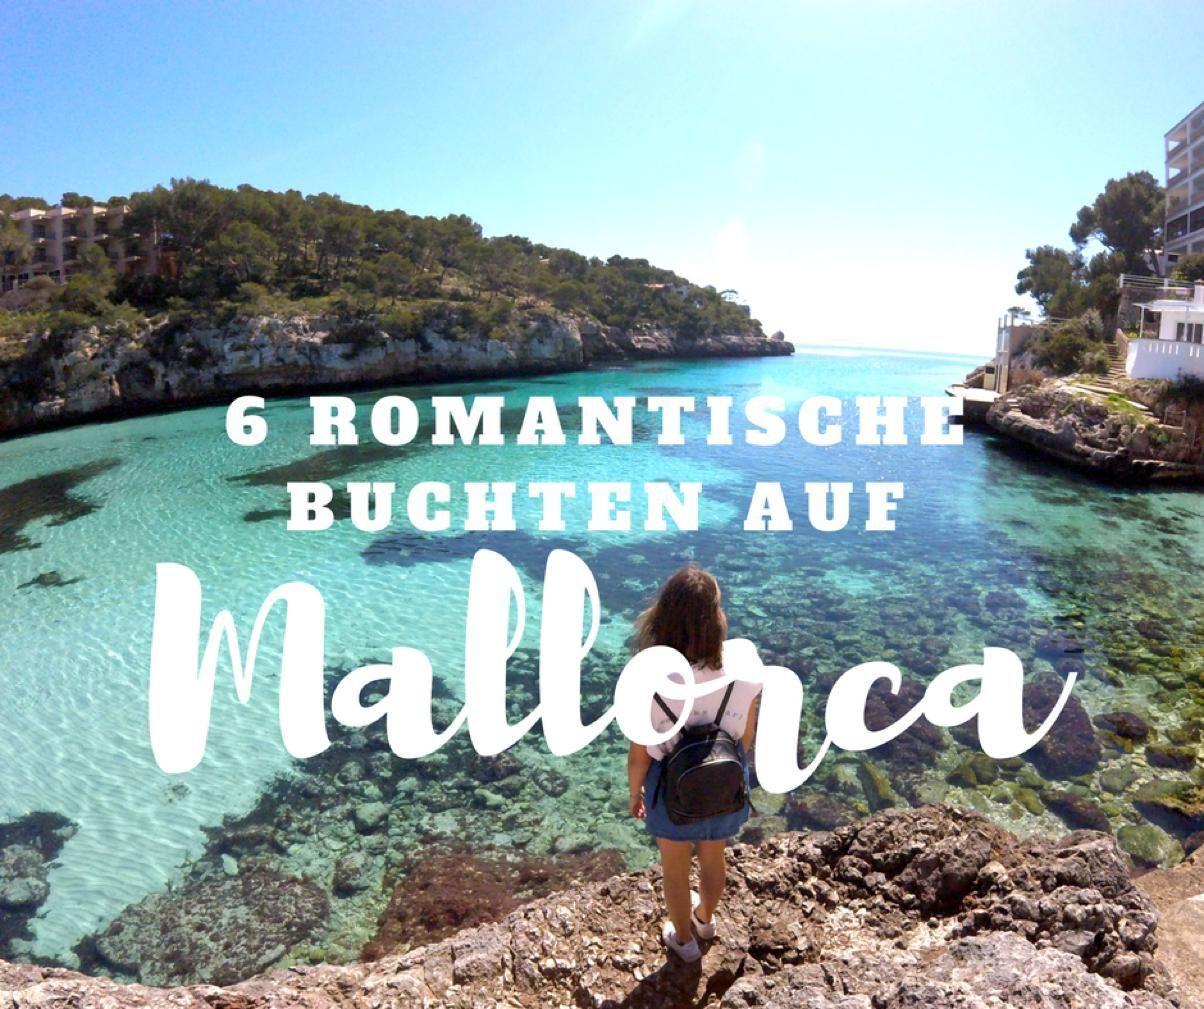 6 romantic bays in Mallorca • Marie from Worldonabudget -  Mallorca in spring is something for romantics! We present you six romantic bays in Mallorca for tin - #bays #catnoir #frozenelsa #Mallorca #Marie #miraculousladybug #Onward #romantic #SpongeBob #WonderPark #Worldonabudget